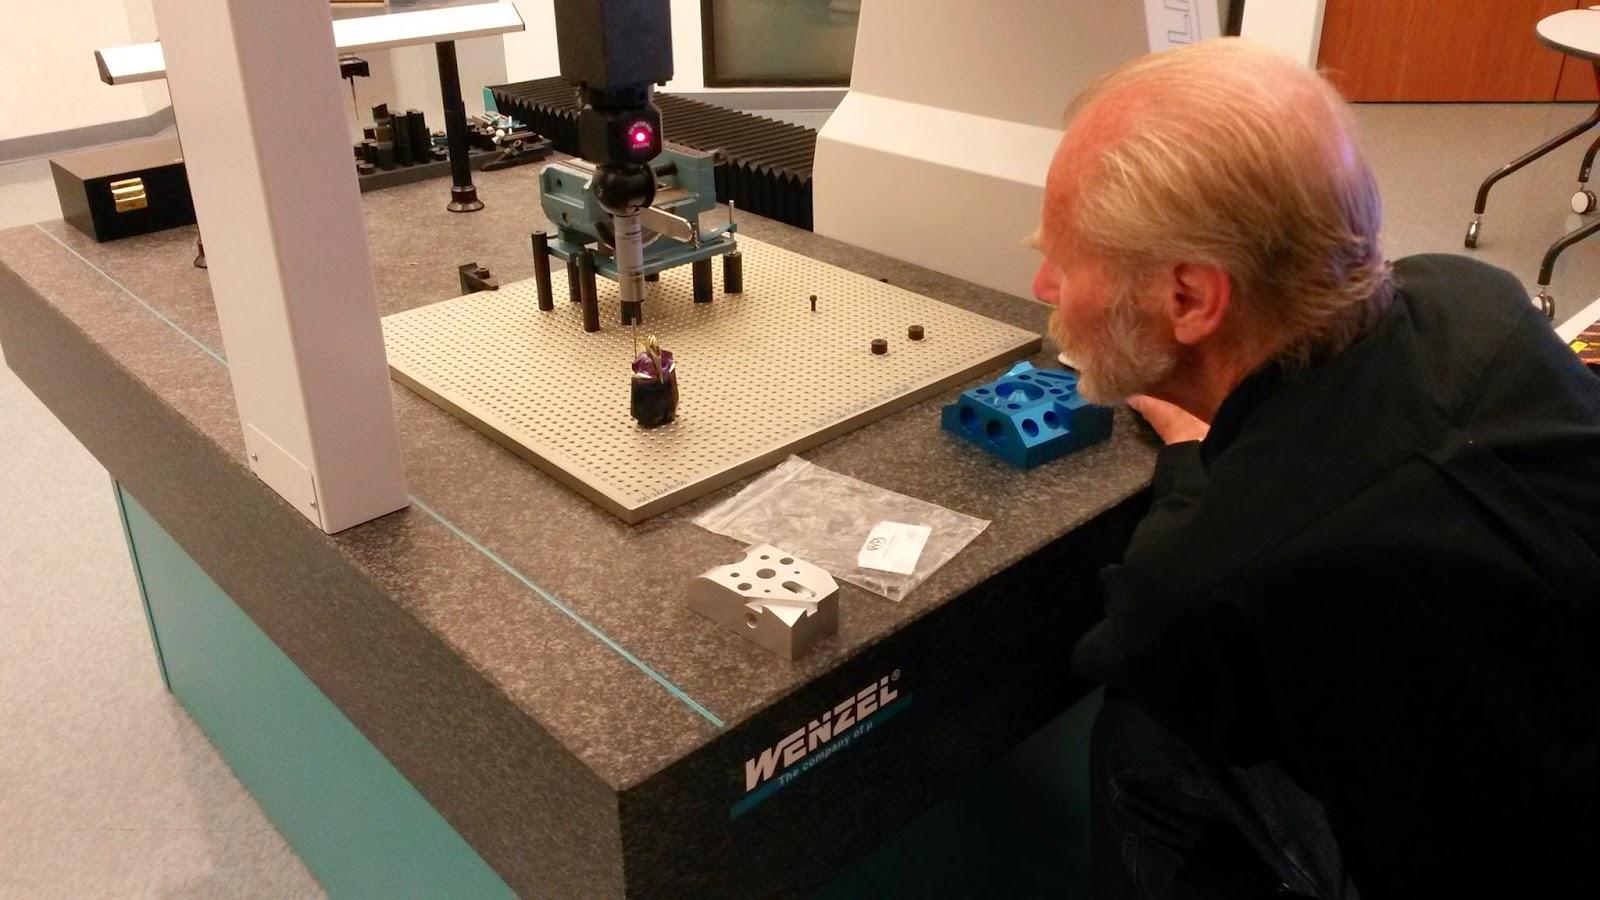 Man using CMM machine to inspect perfume bottle